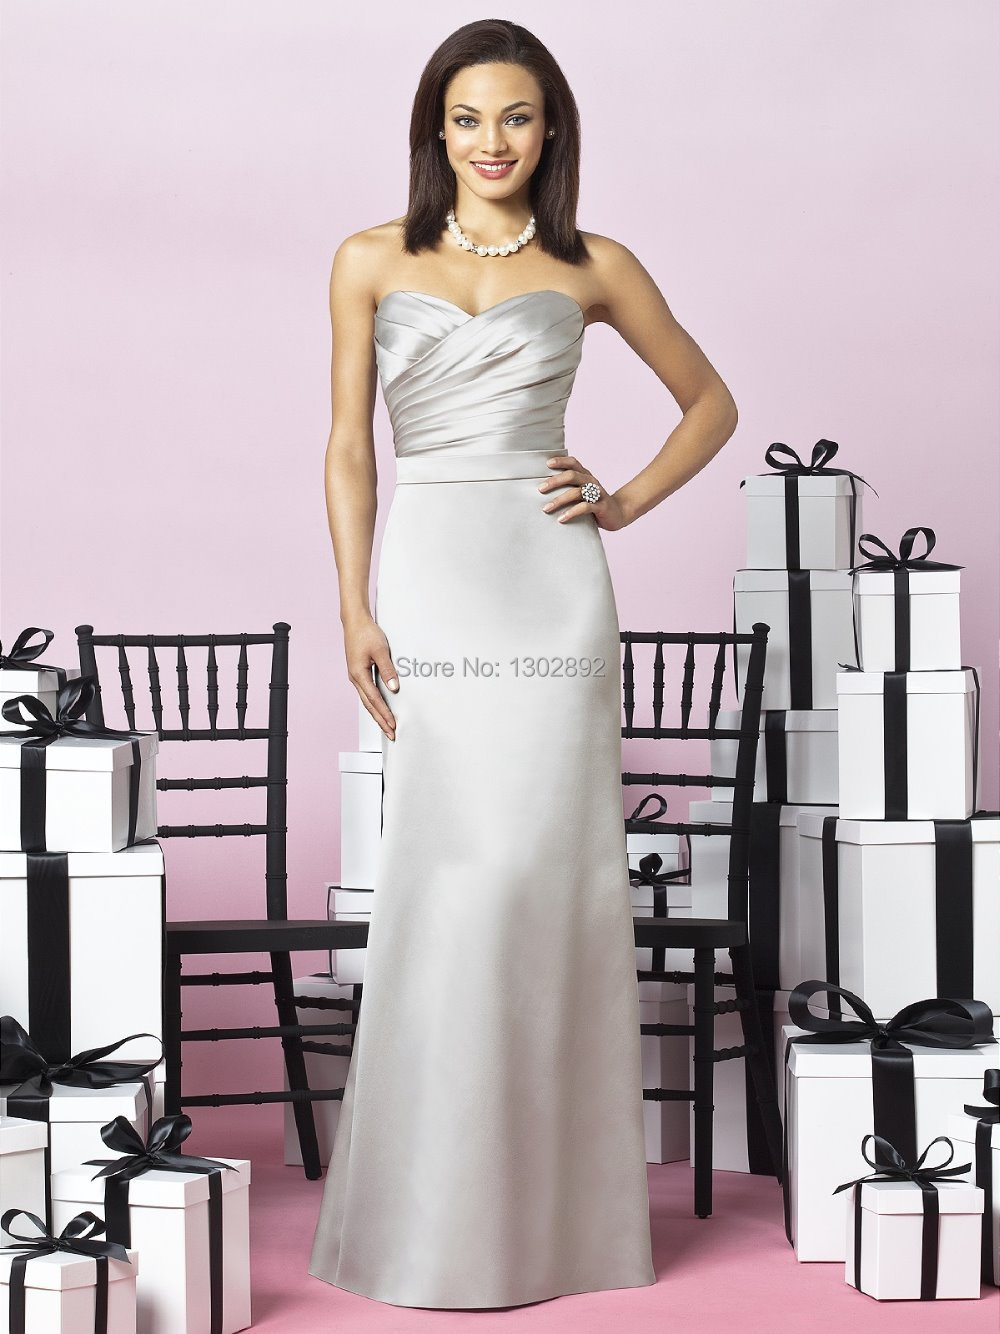 Simple Wedding Dresses Under 100 - Ocodea.com